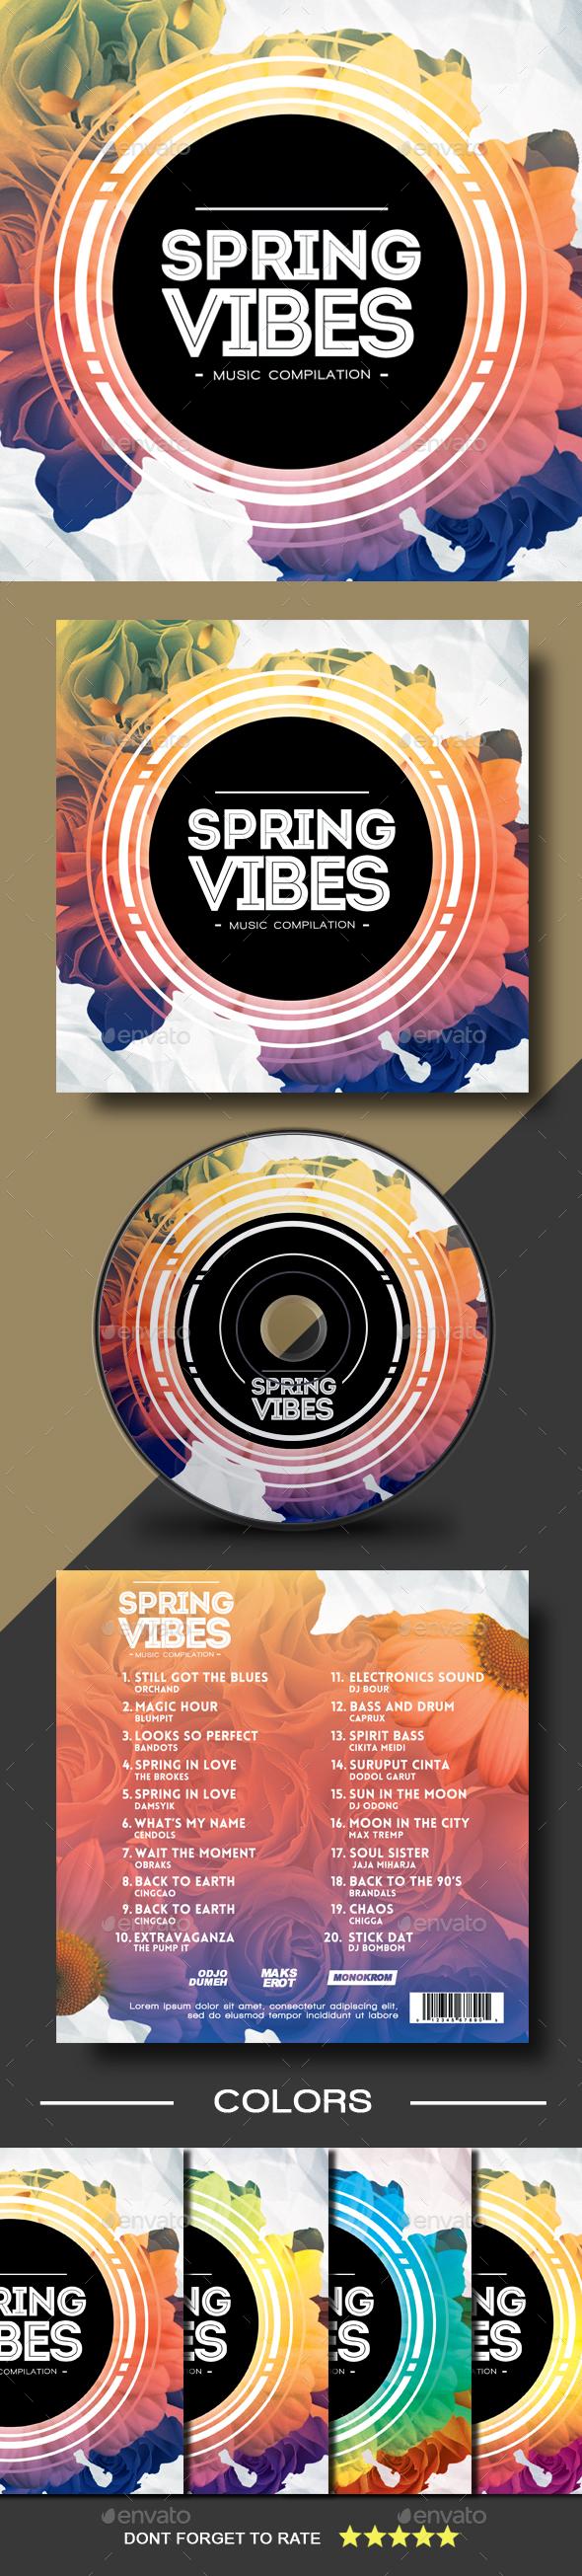 Spring Vibes CD Cover Artwork - CD & DVD Artwork Print Templates